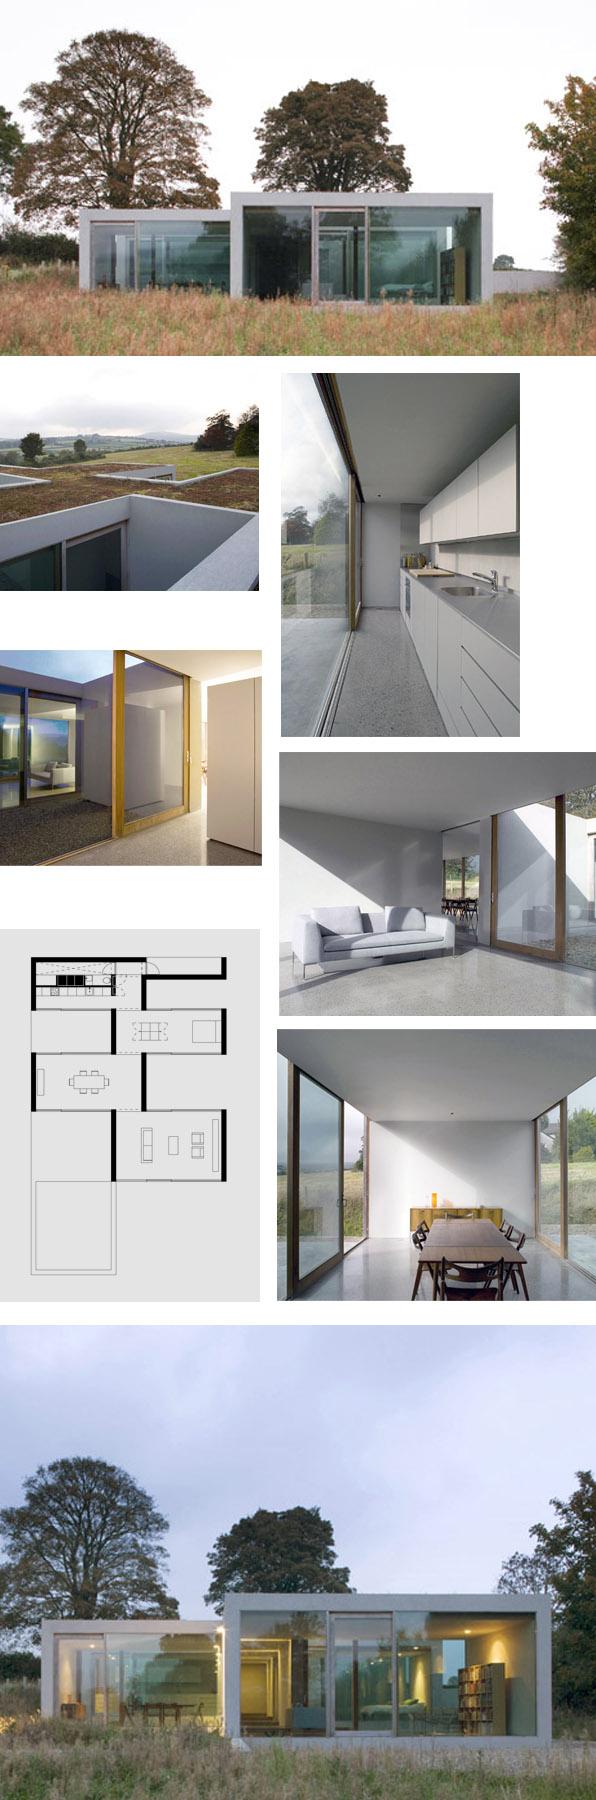 casa rural moderna de Boyd Cody Architects en MODUS VIVENDI arquitectura